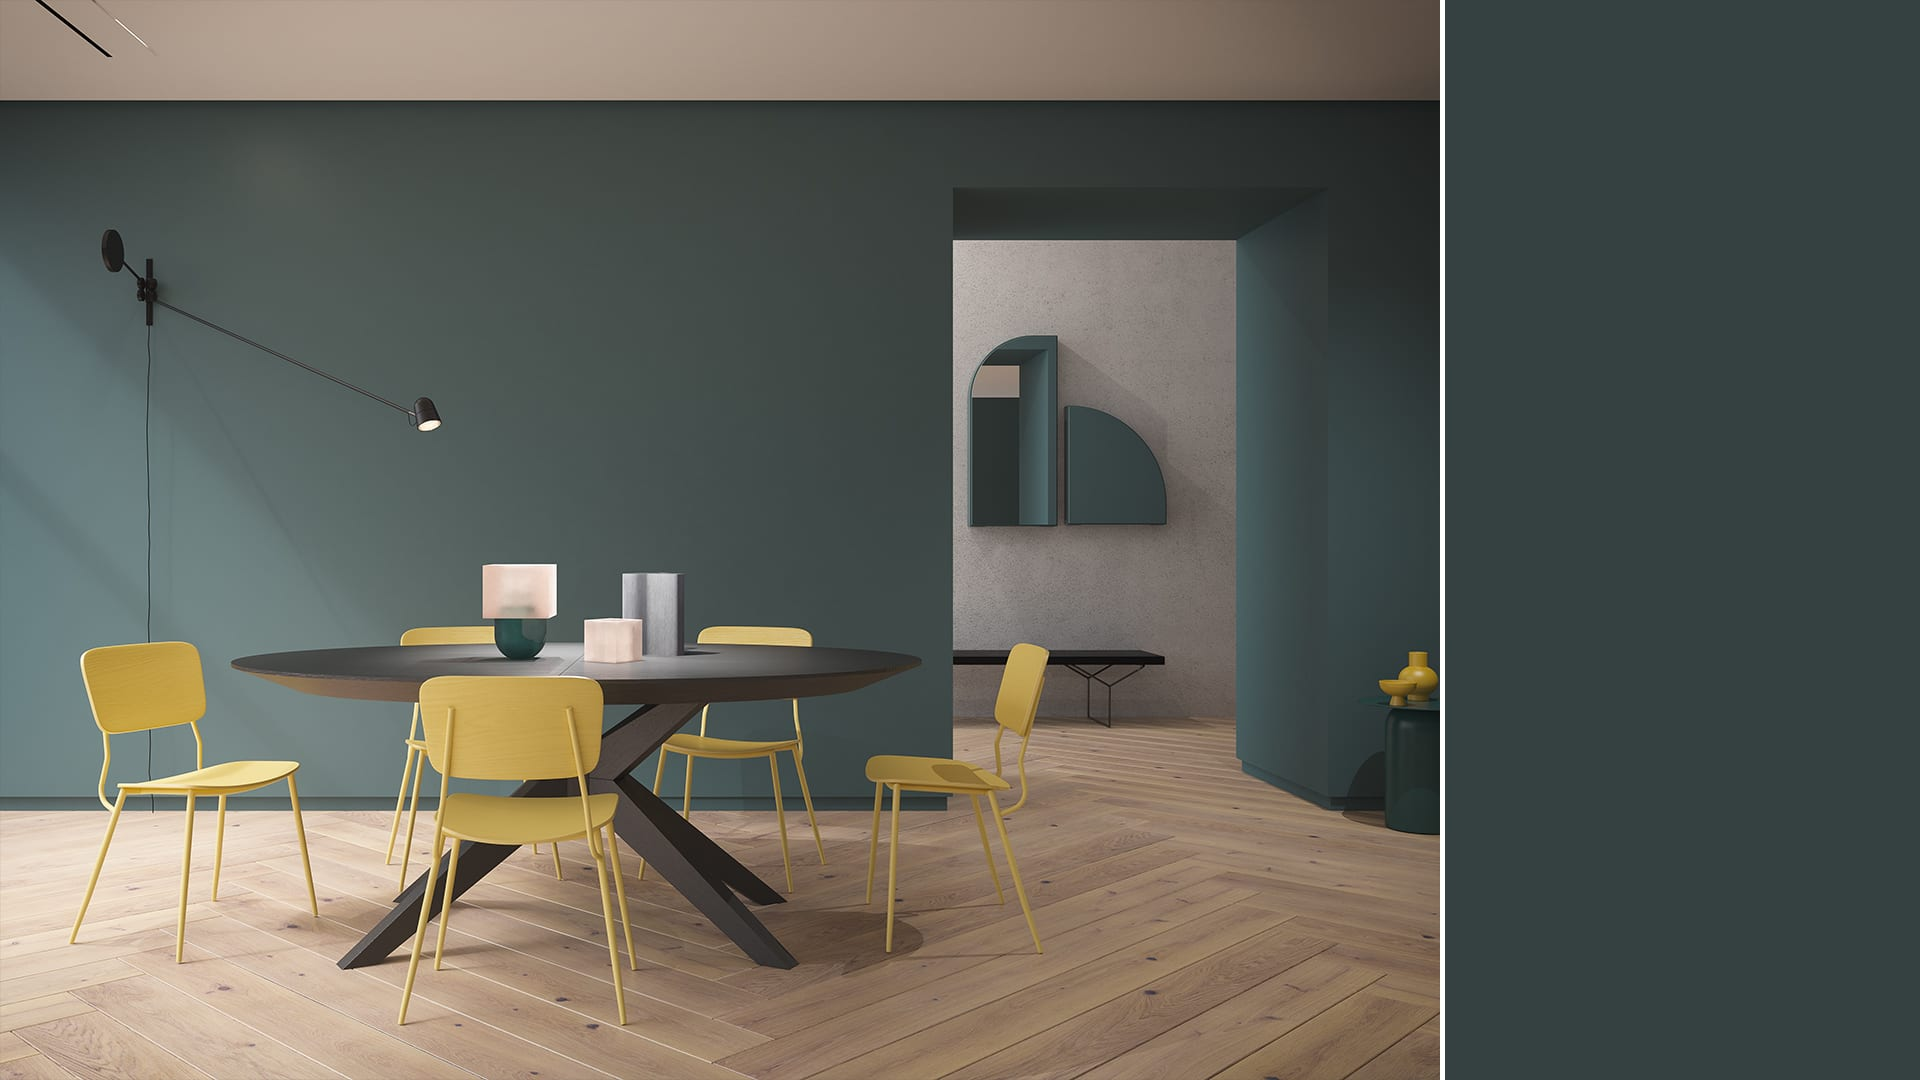 Maayan-Golan_Architectural-Visualization_3d-product-visualization_zaga-dining_11